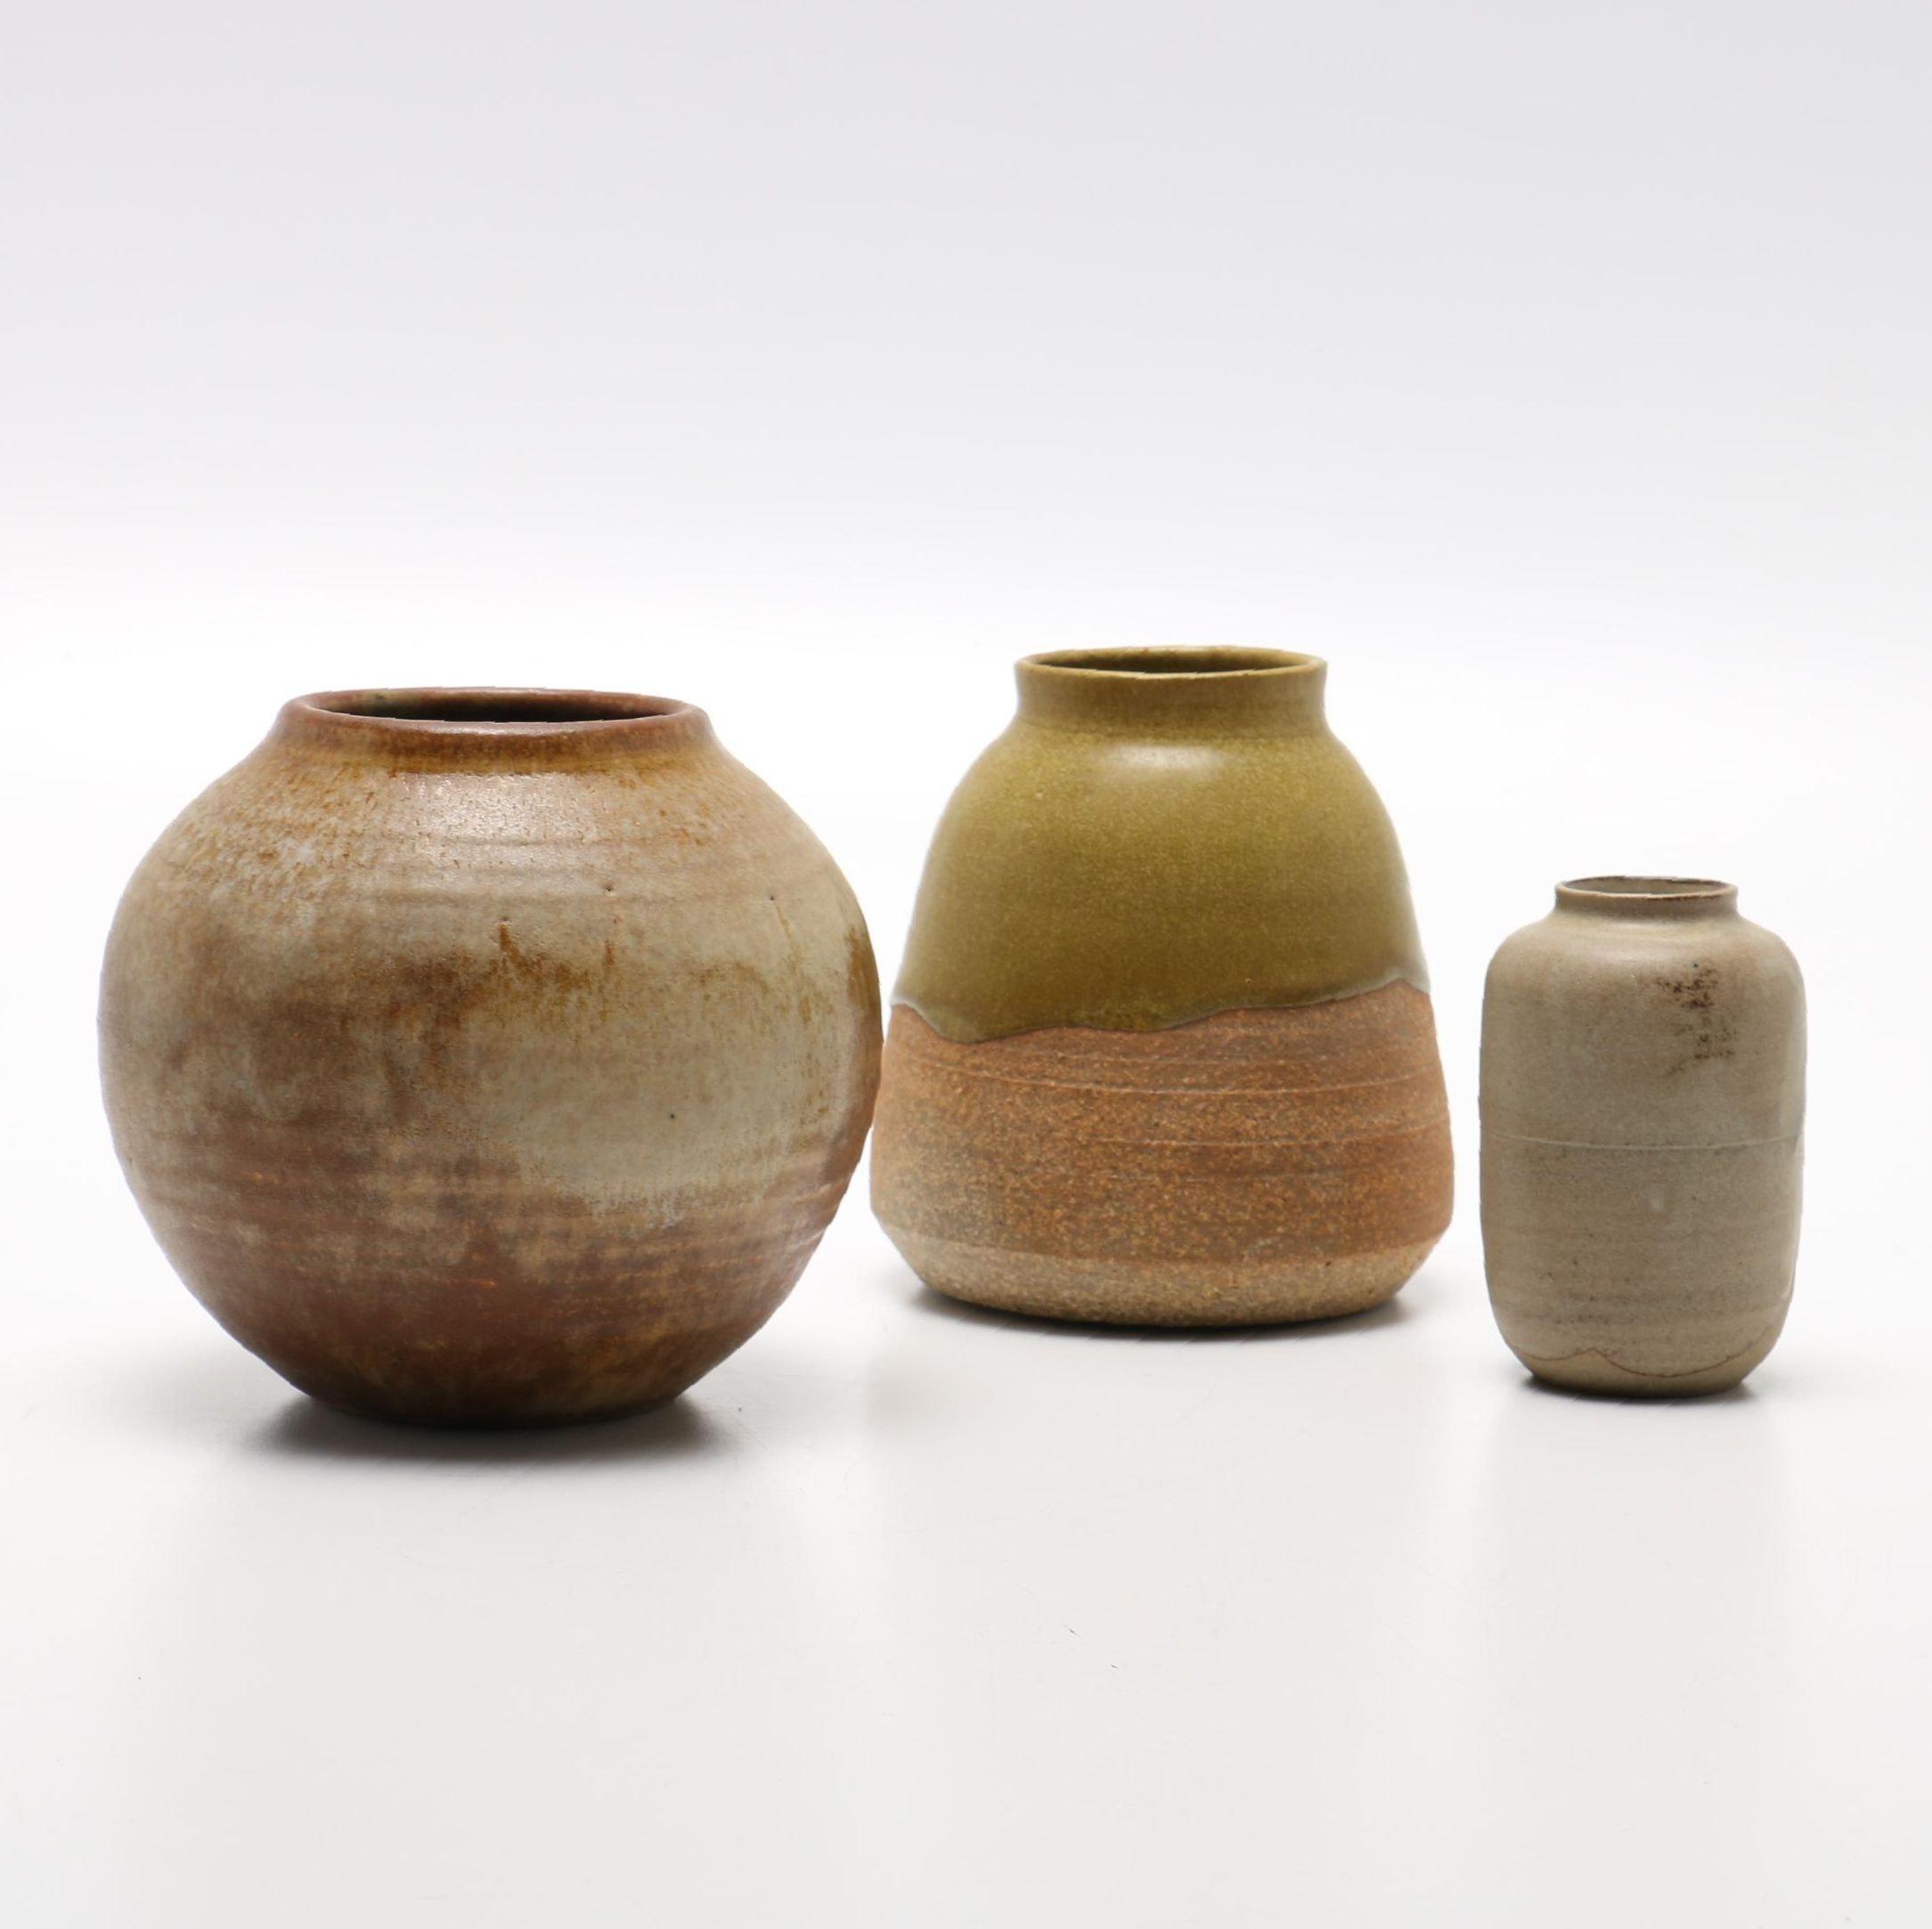 Hand Thrown Stoneware Studio Art Vases